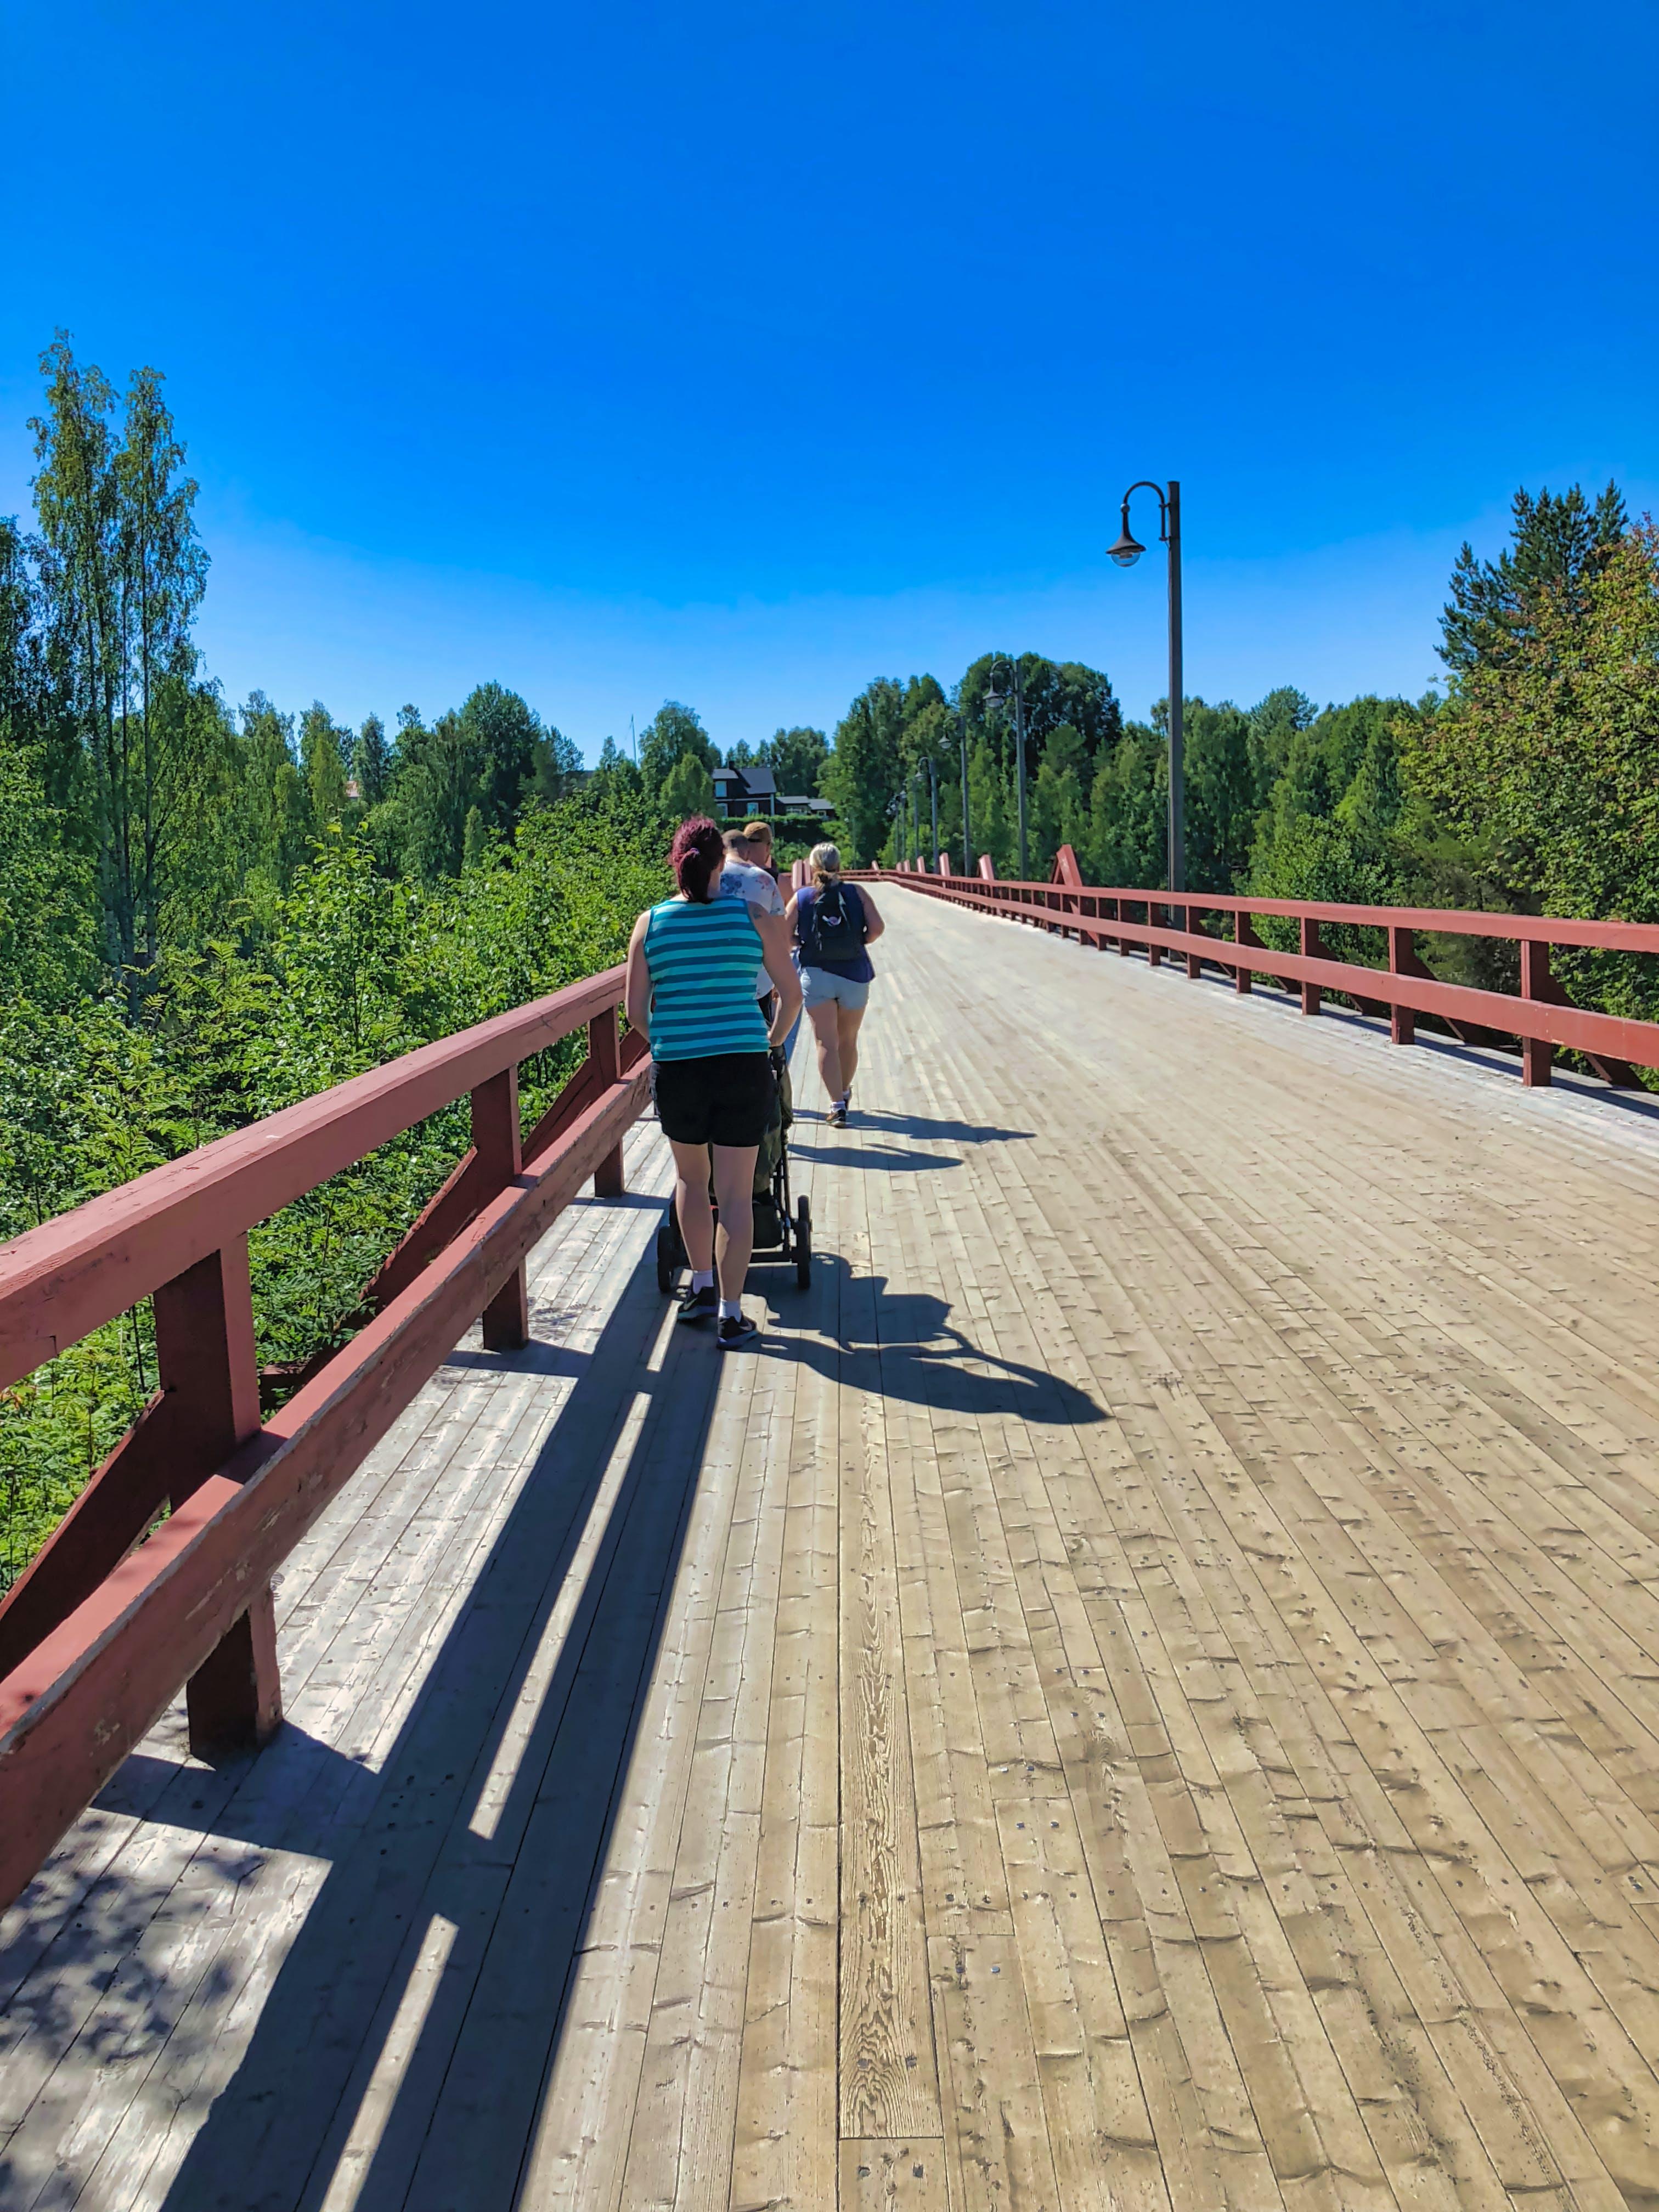 Free stock photo of wood, sun, bridge, blue skies